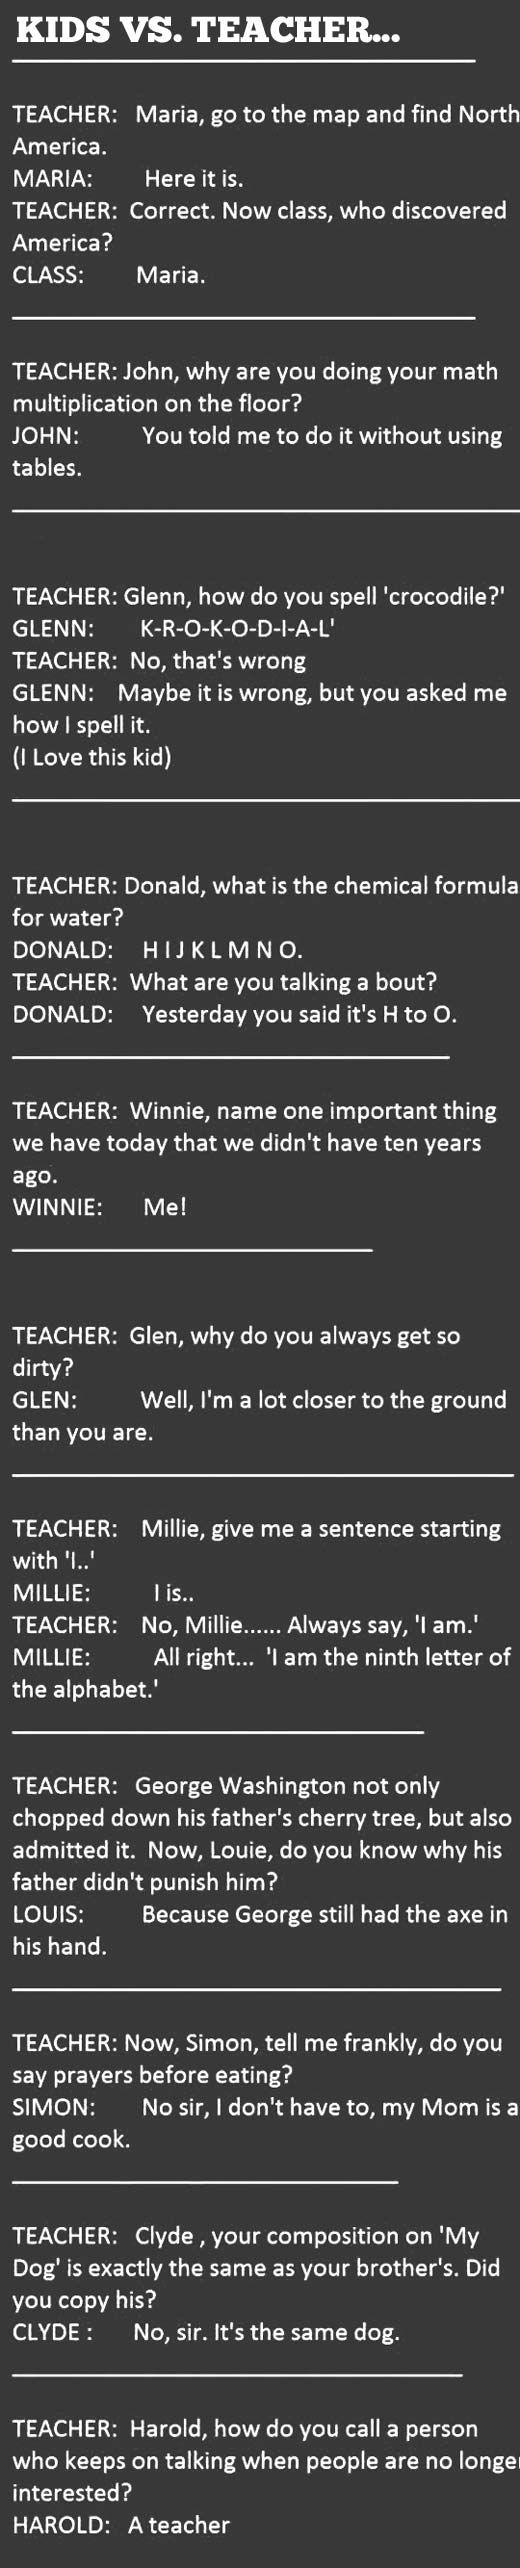 kids vs teachers